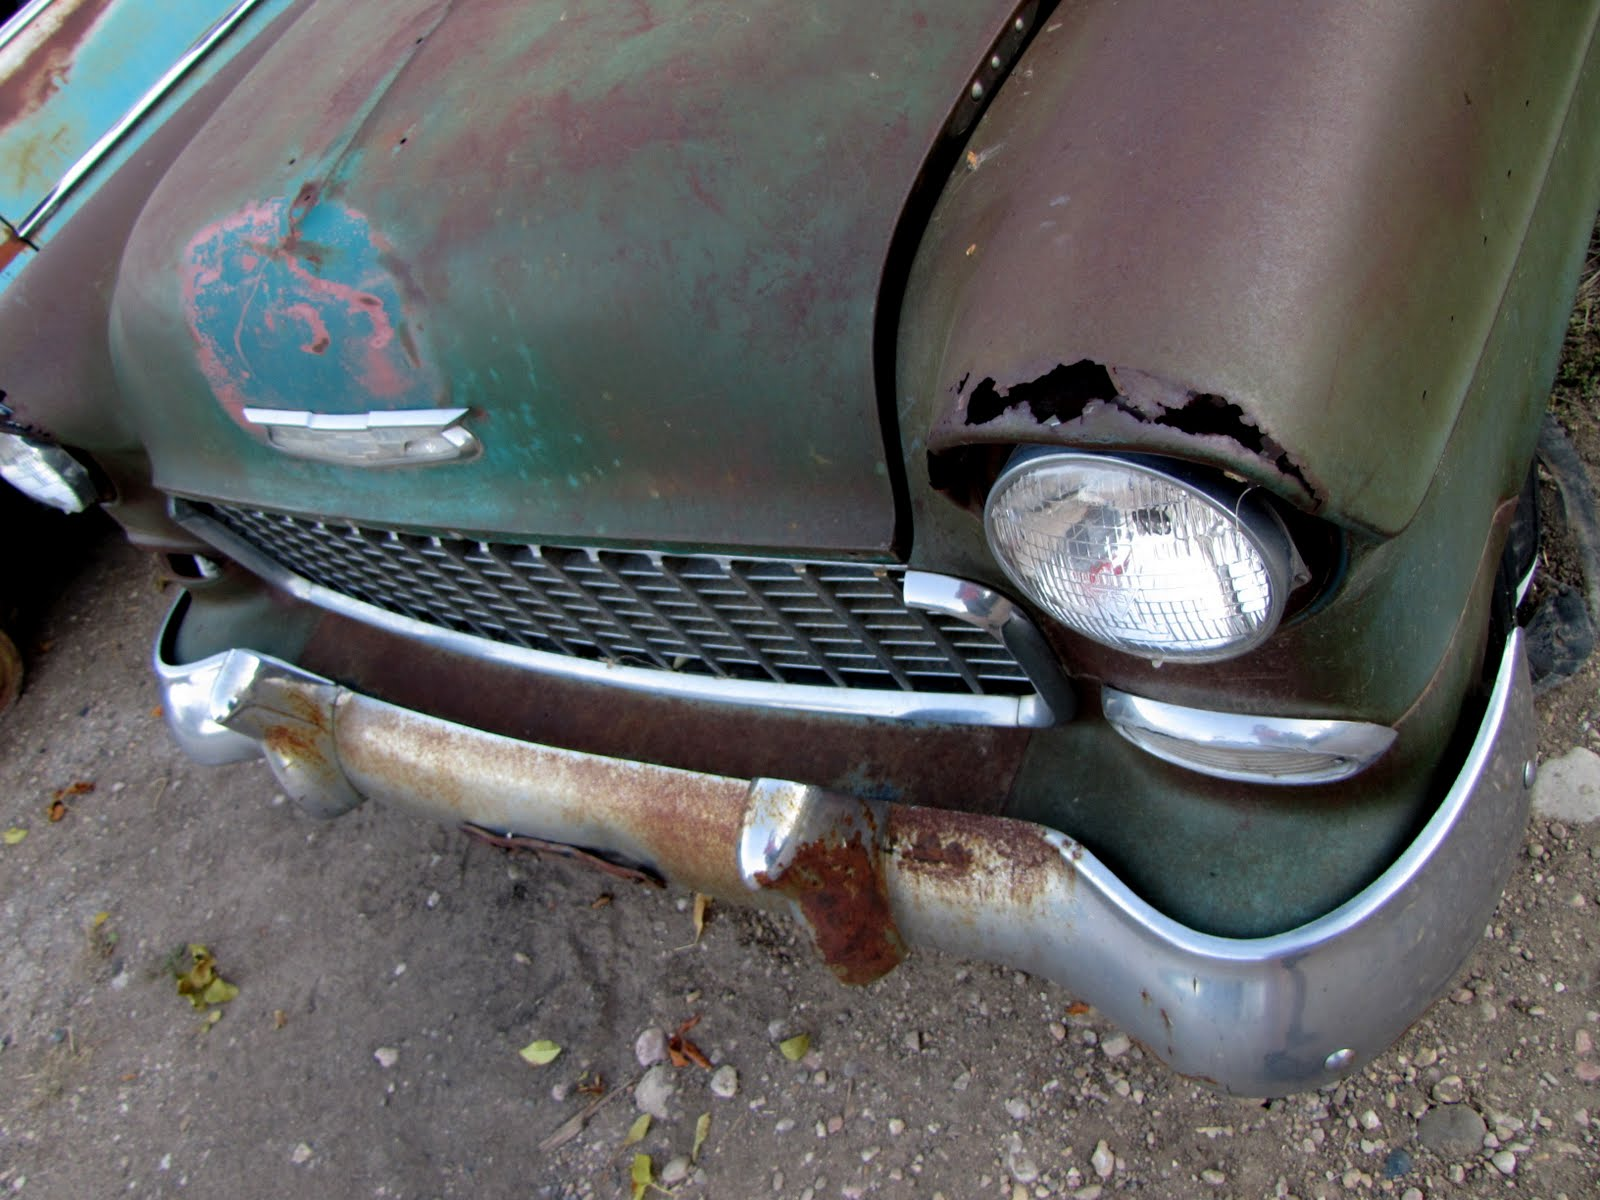 Rozsda-lyuk RustHole, 1957 Chevrolet Bel Air